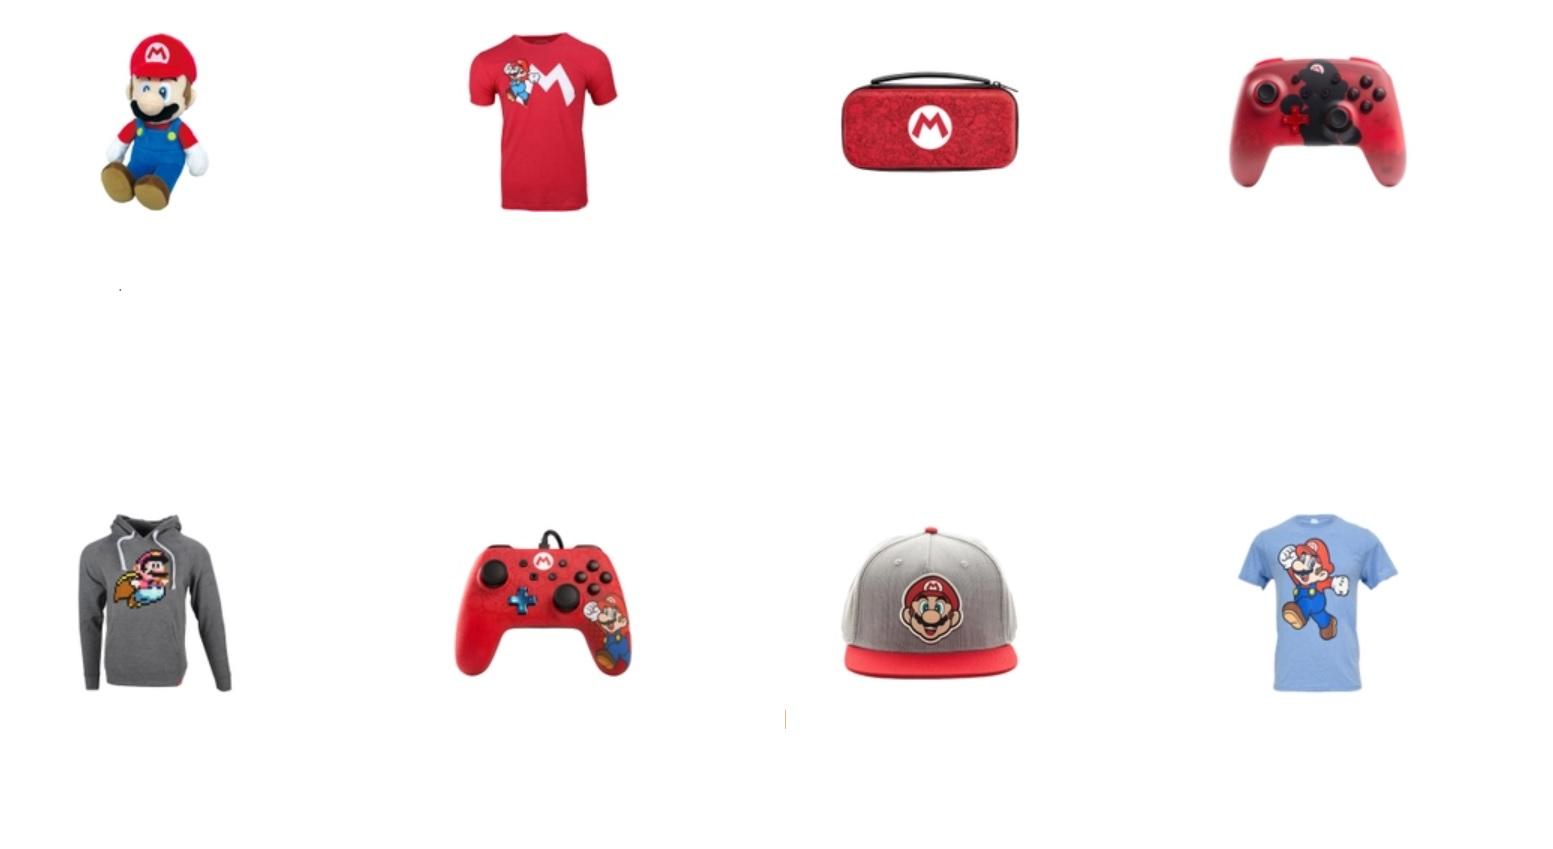 Nintendo is offering a 20% discount on Mario merch through My Nintendo screenshot